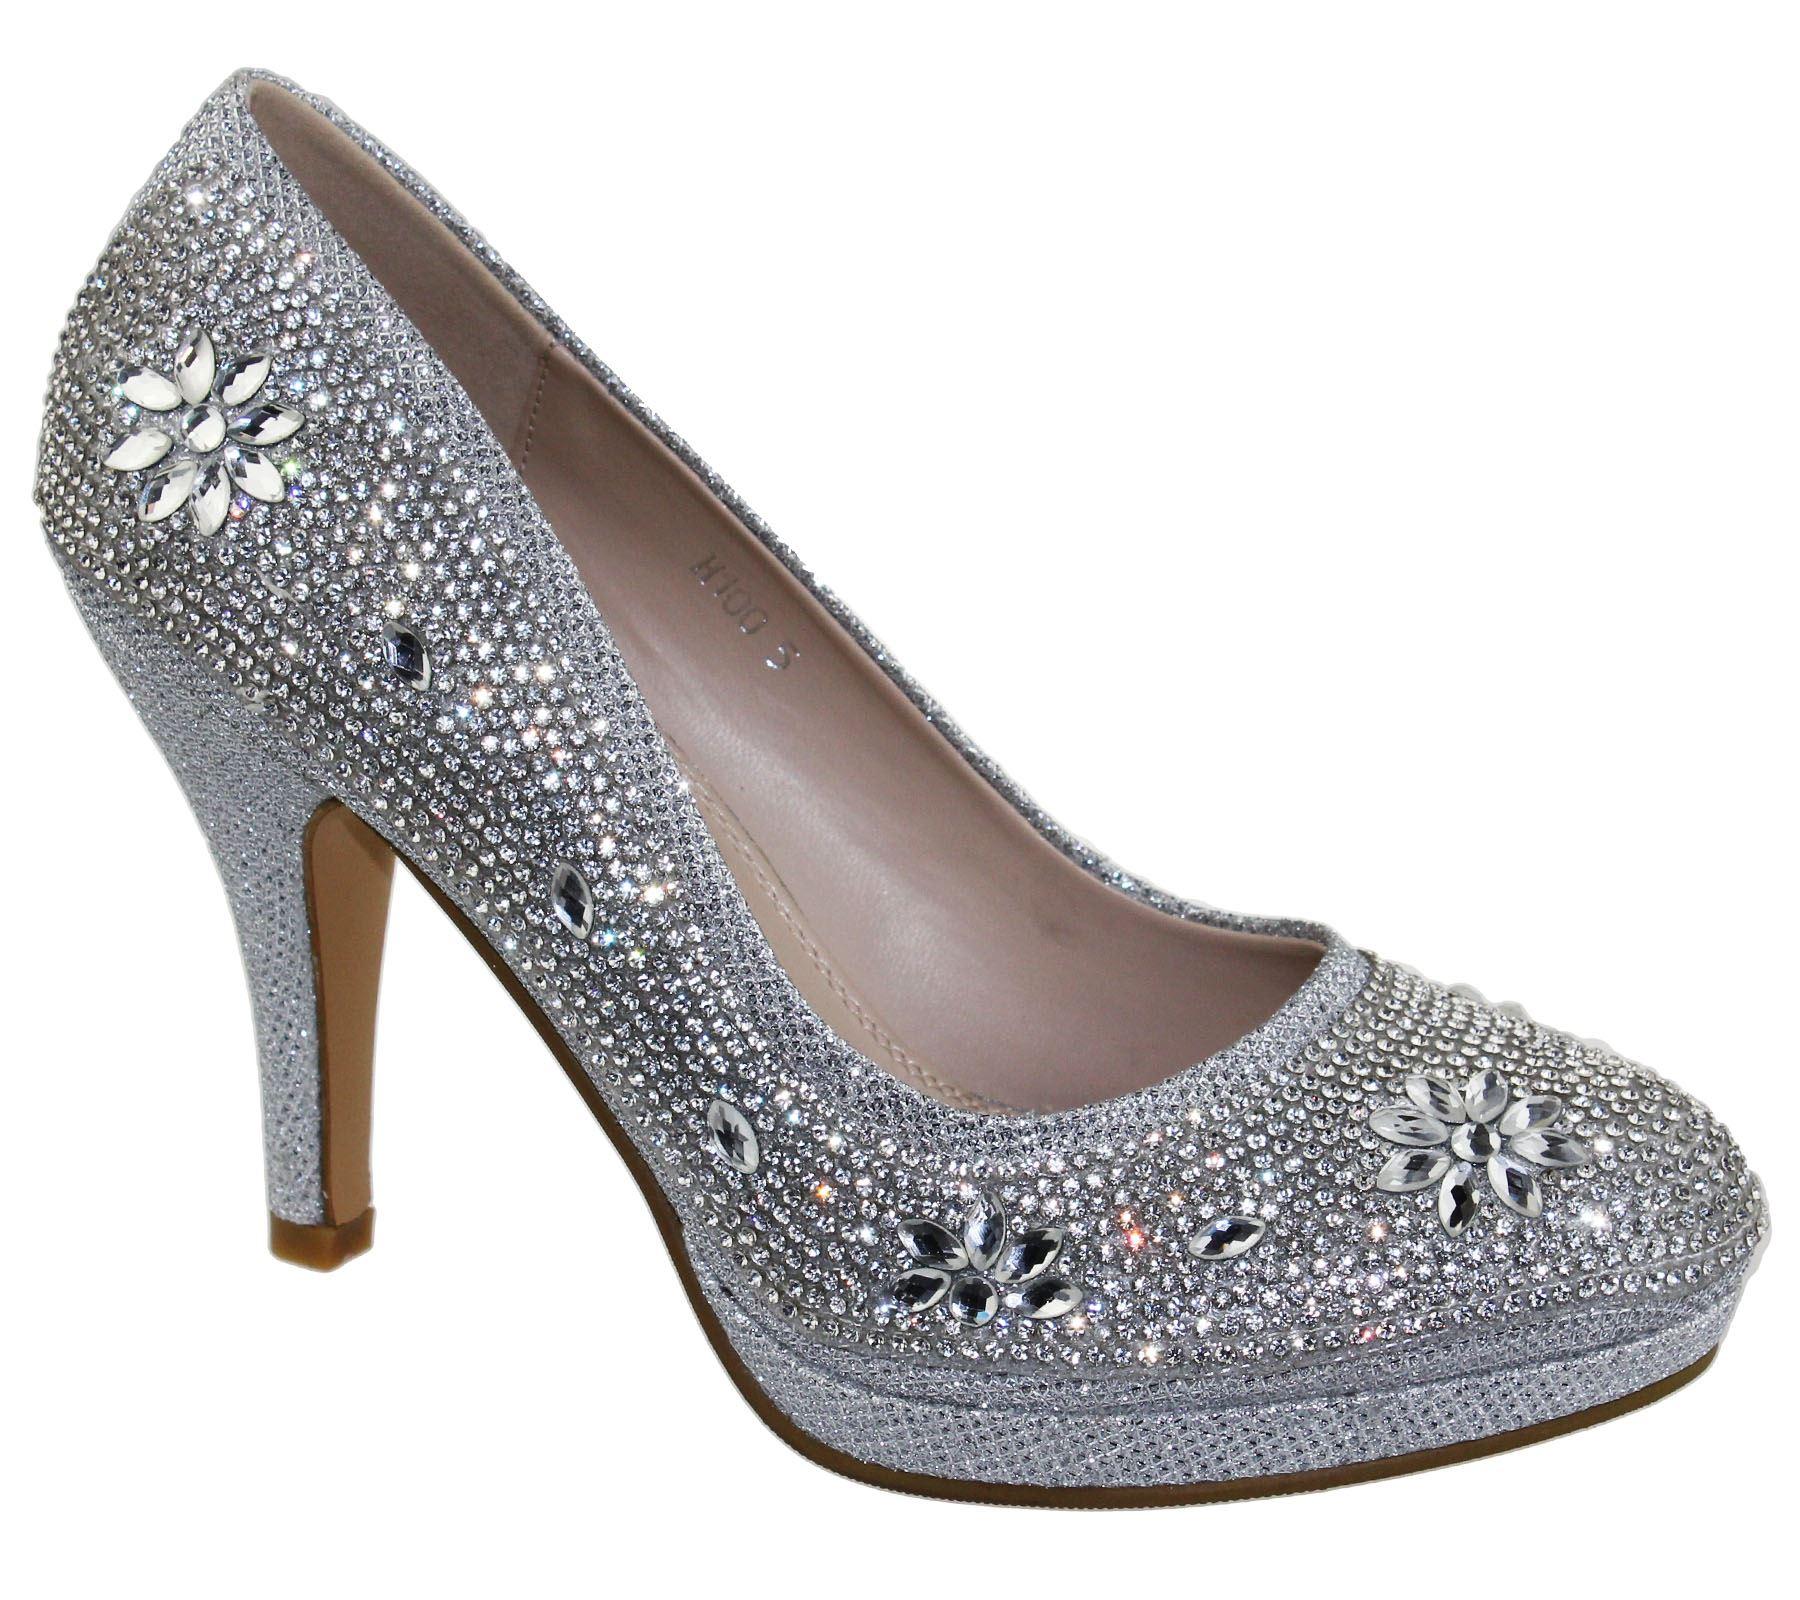 Womens-Platforms-High-Heels-Wedding-Bridal-Evening-Diamante-Ladies-Party-Shoes miniatura 10